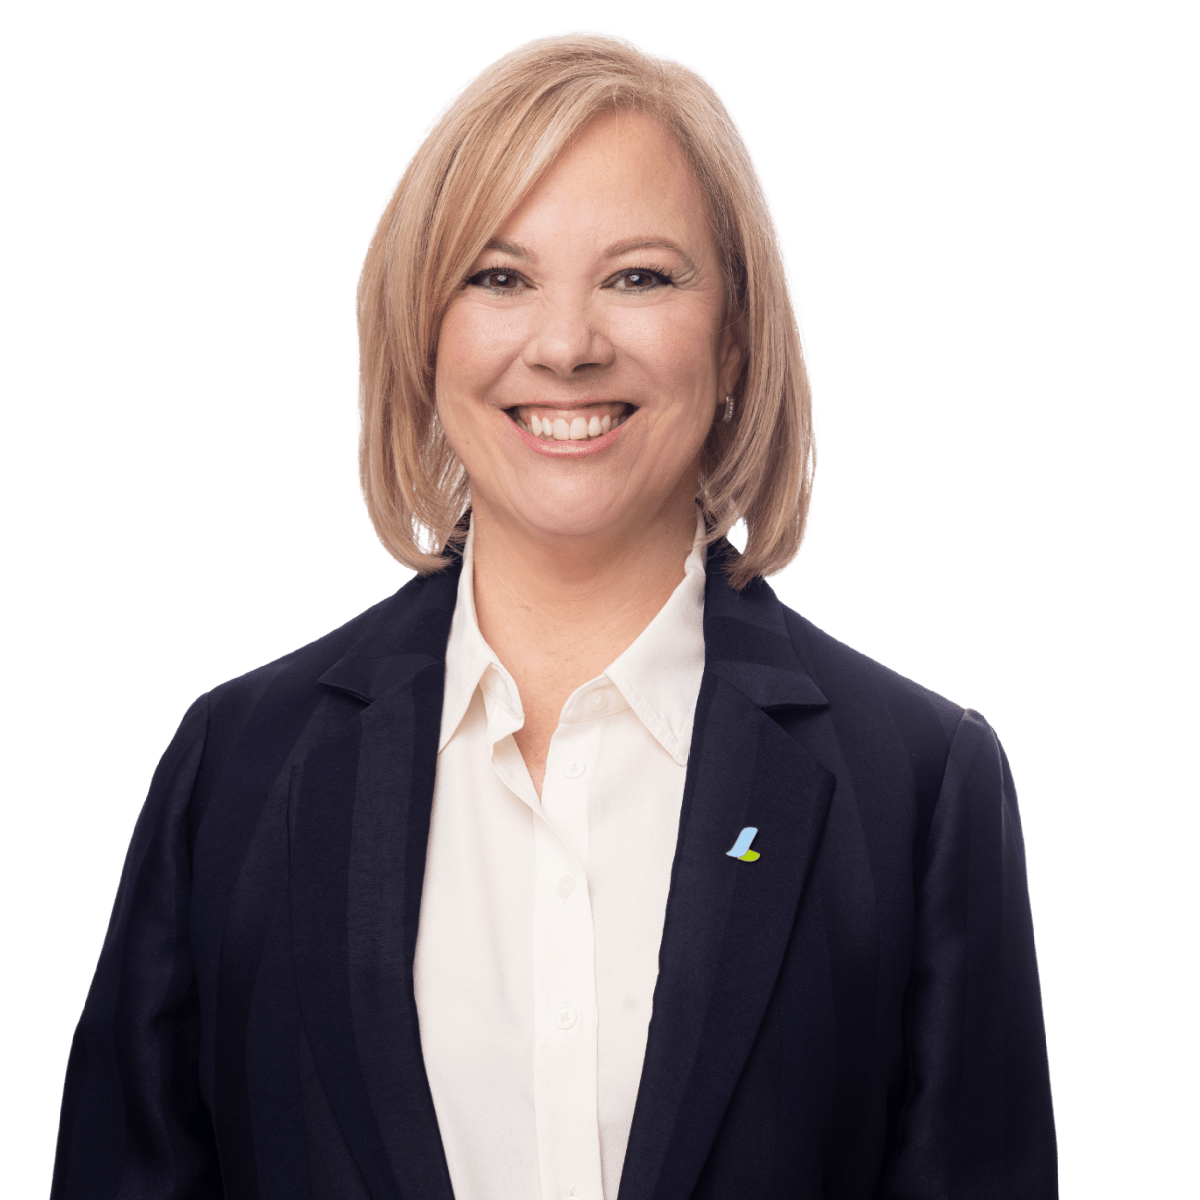 Nos candidats AnneMarieBedard